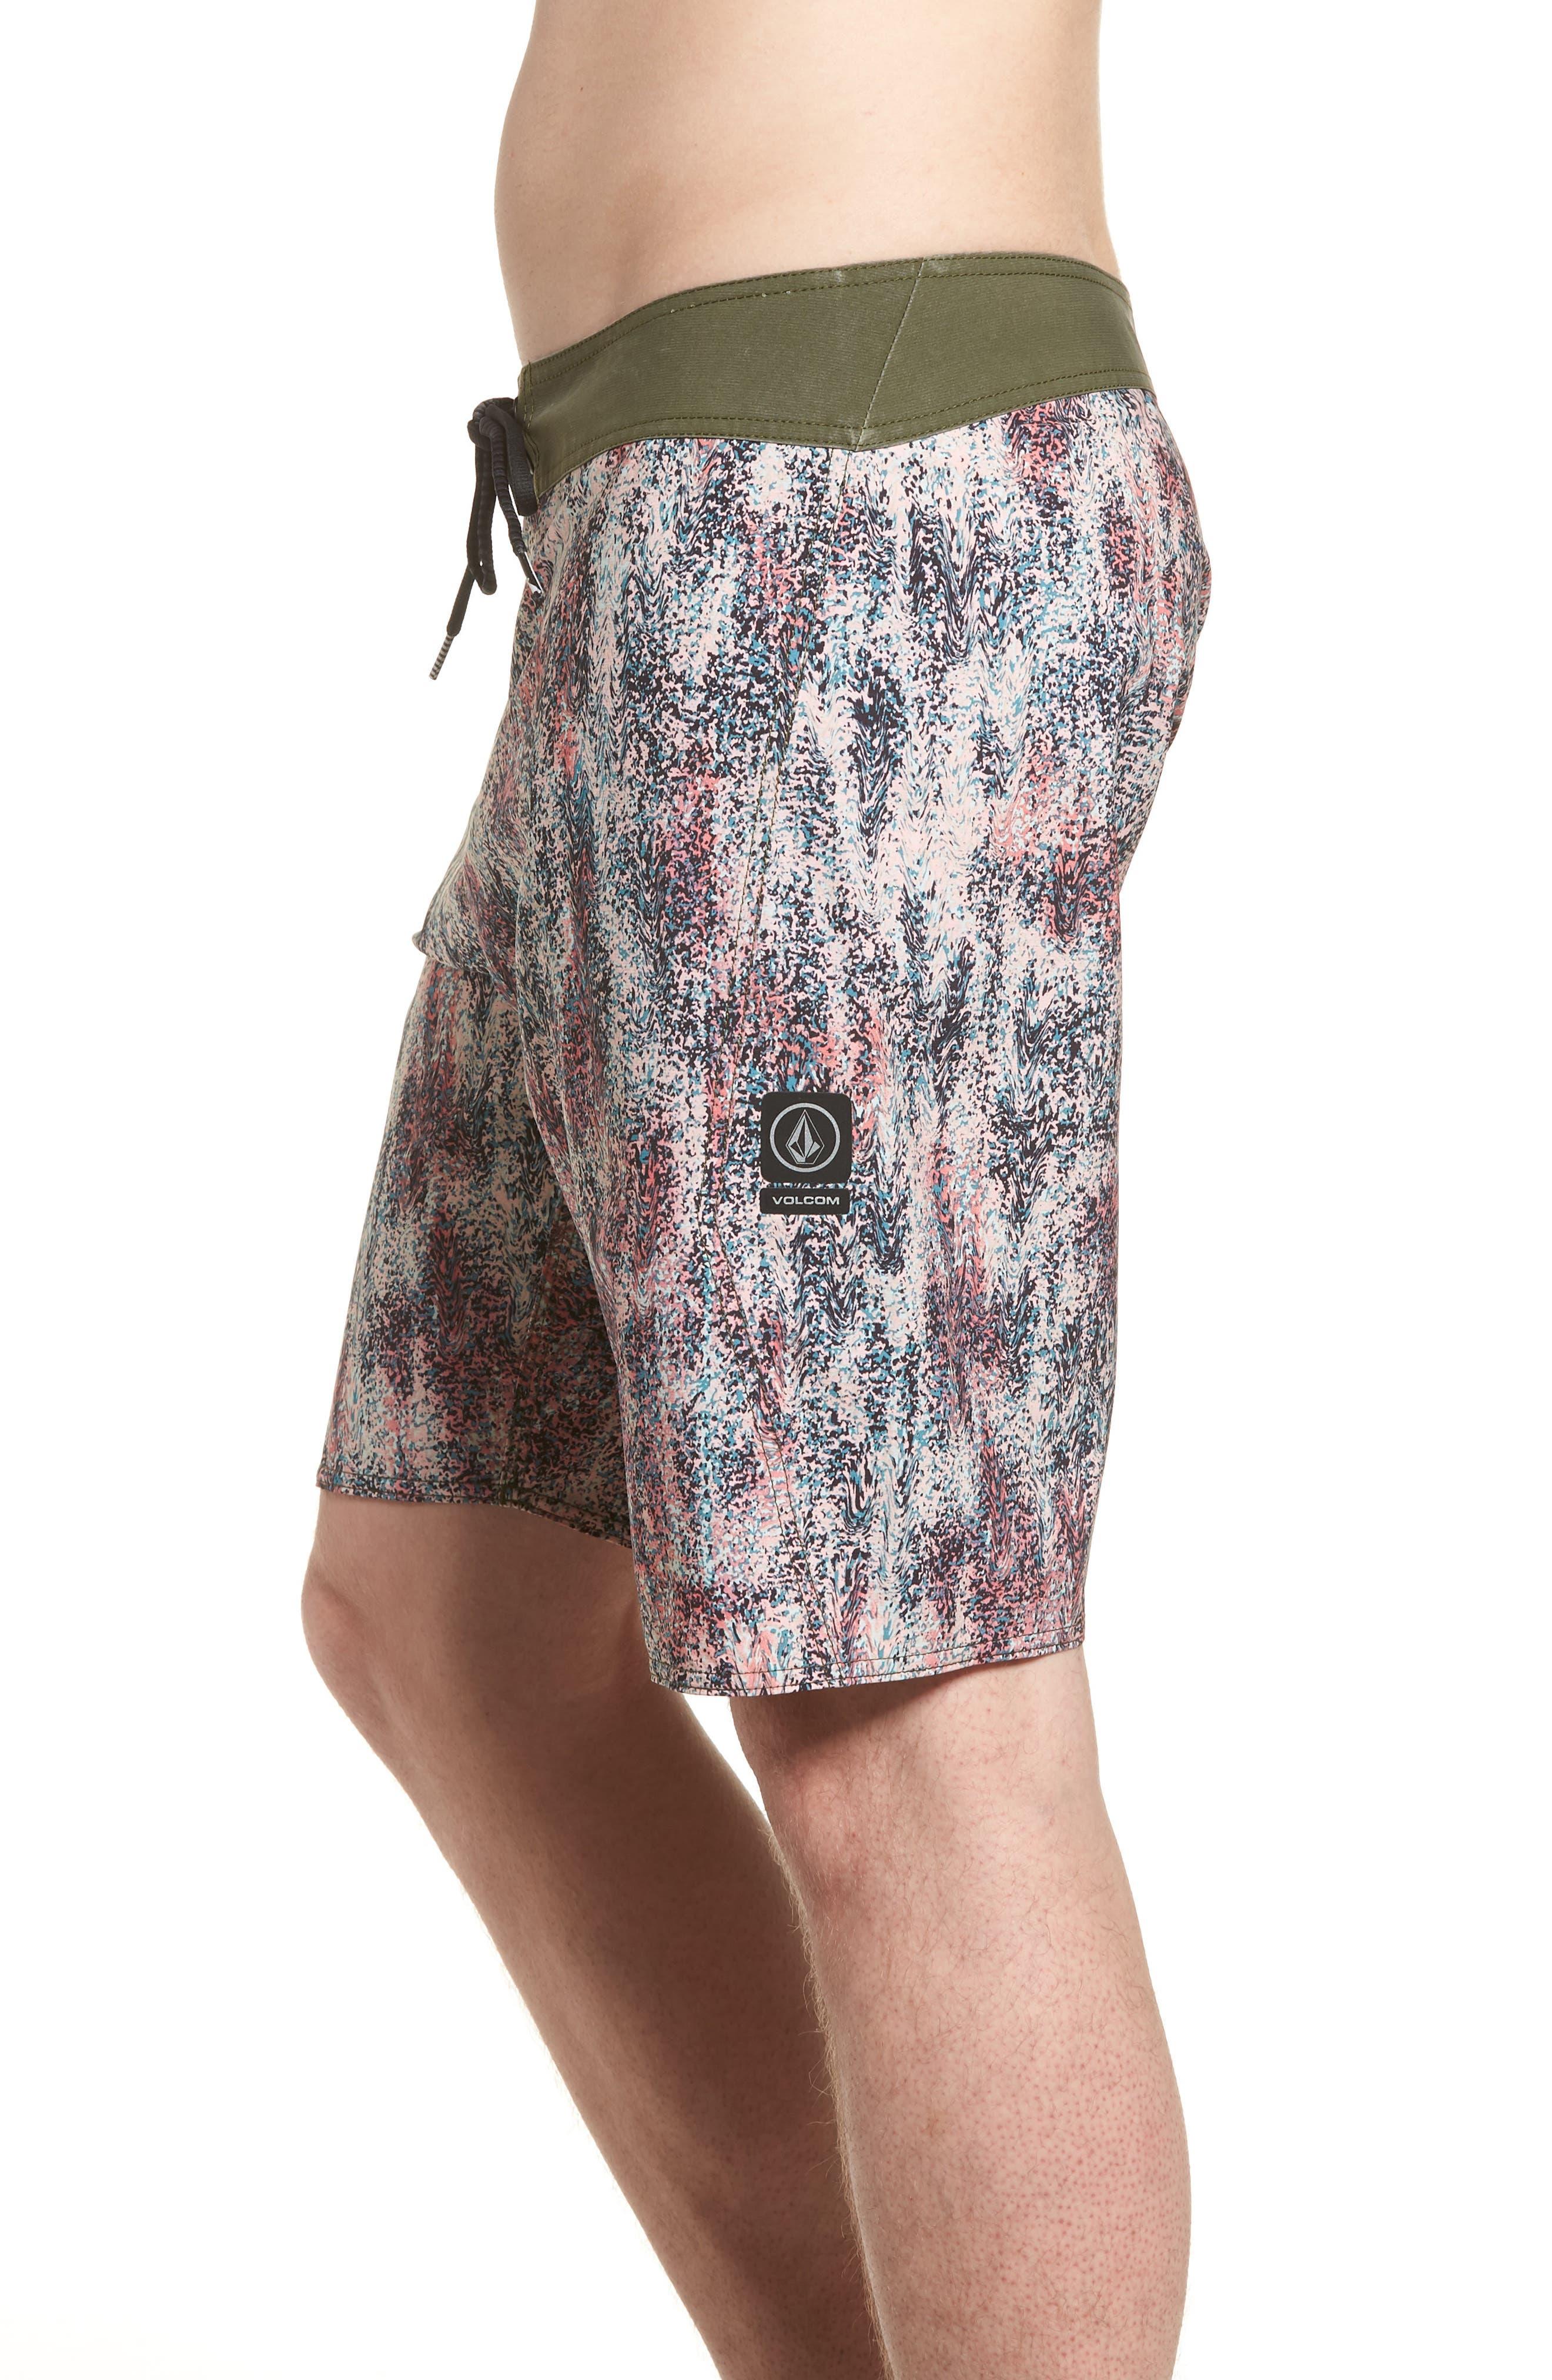 Plasm Mod Board Shorts,                             Alternate thumbnail 4, color,                             020